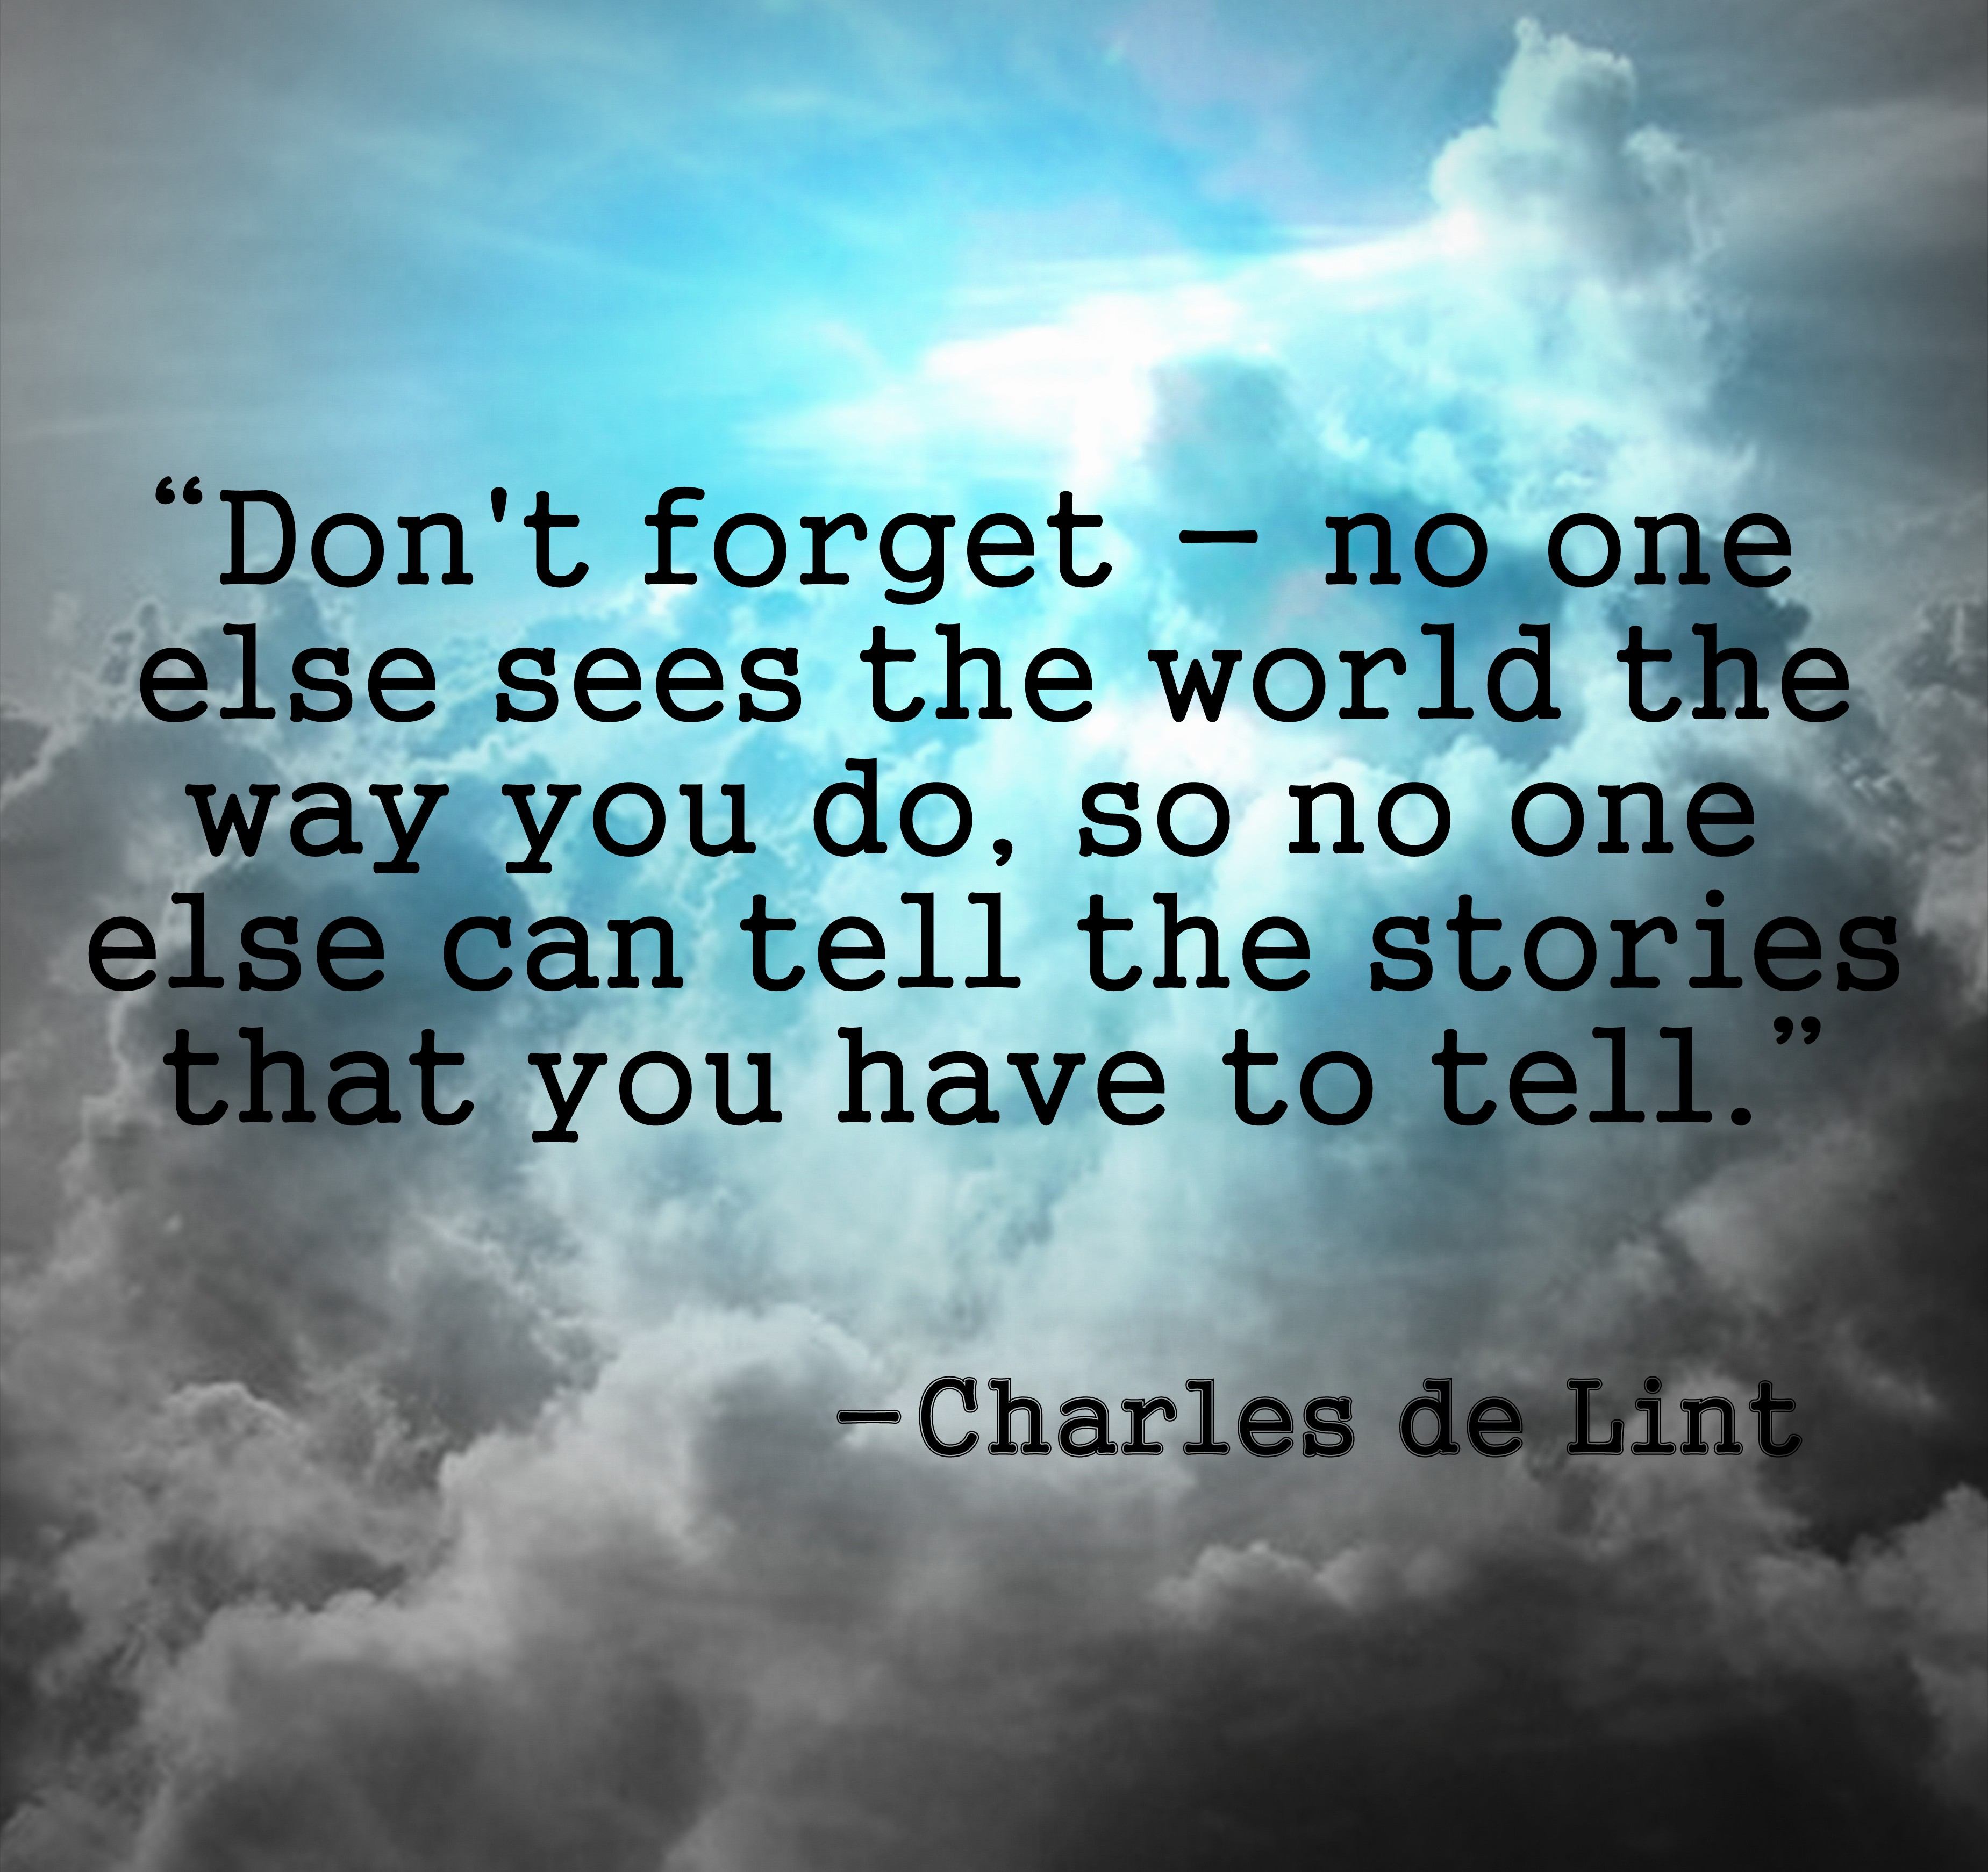 Charles de Lint's quote #1